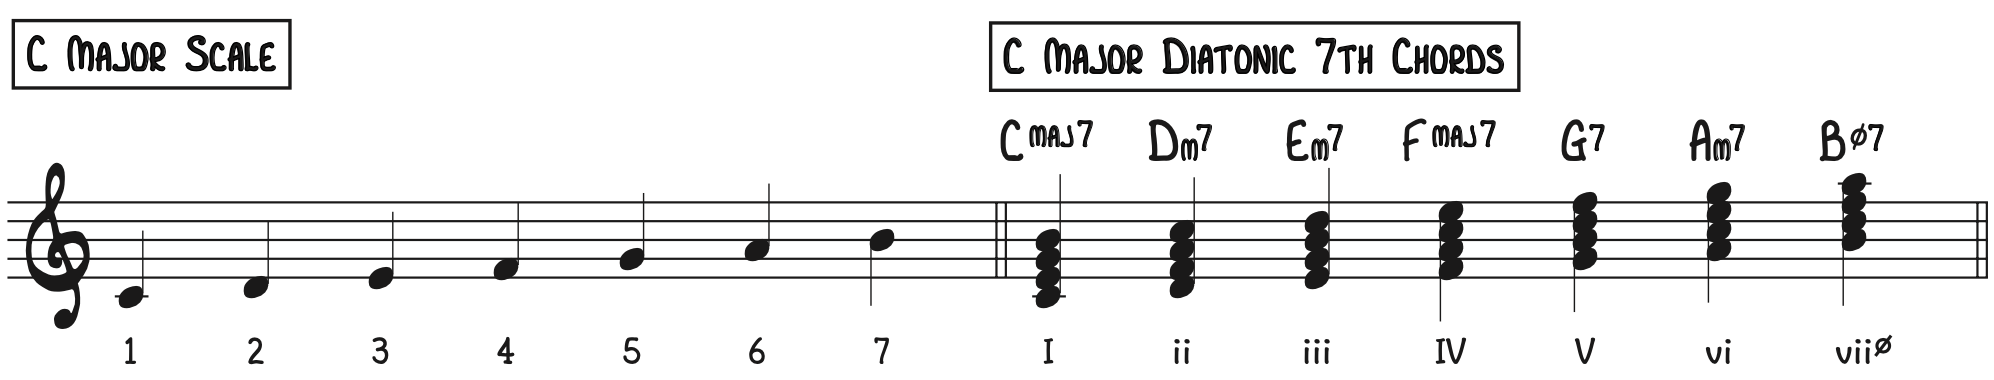 C Major Scale & Diatonic 7th Chords to improvise jazz piano